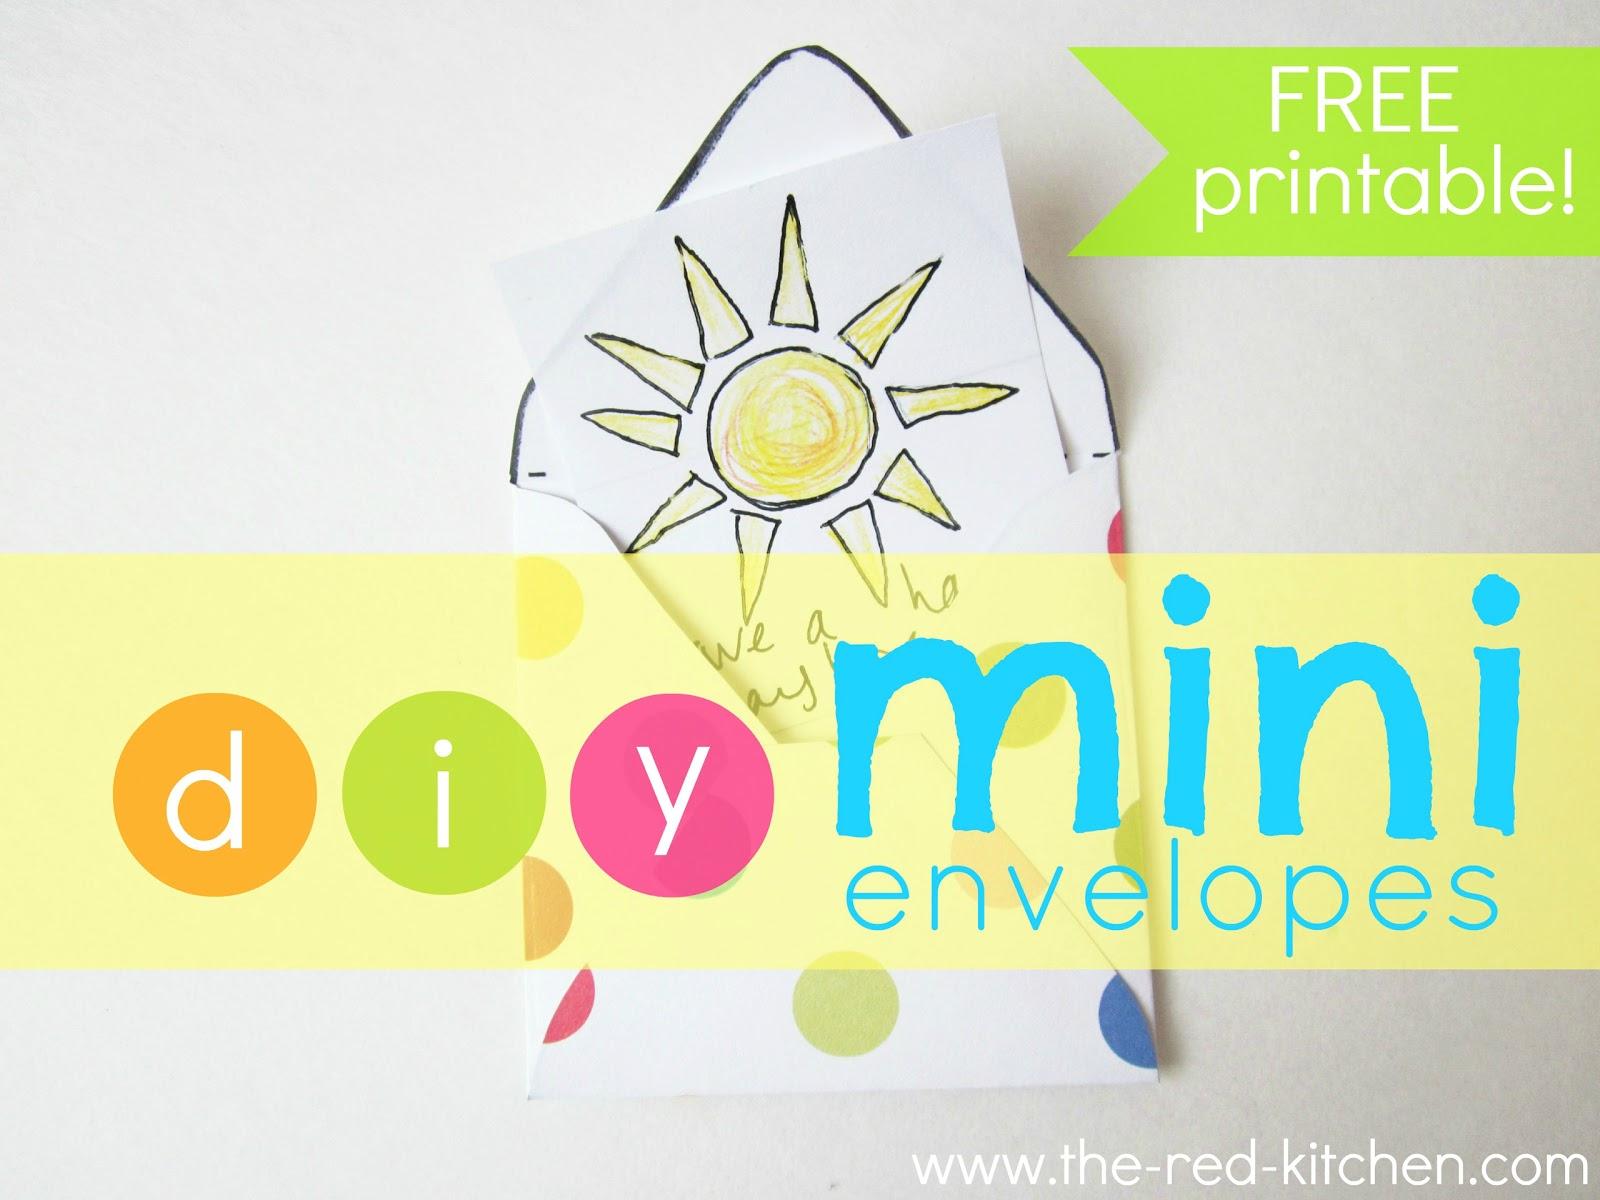 The Red Kitchen Diy Mini Envelopes Free Printable Pattern Tutorial